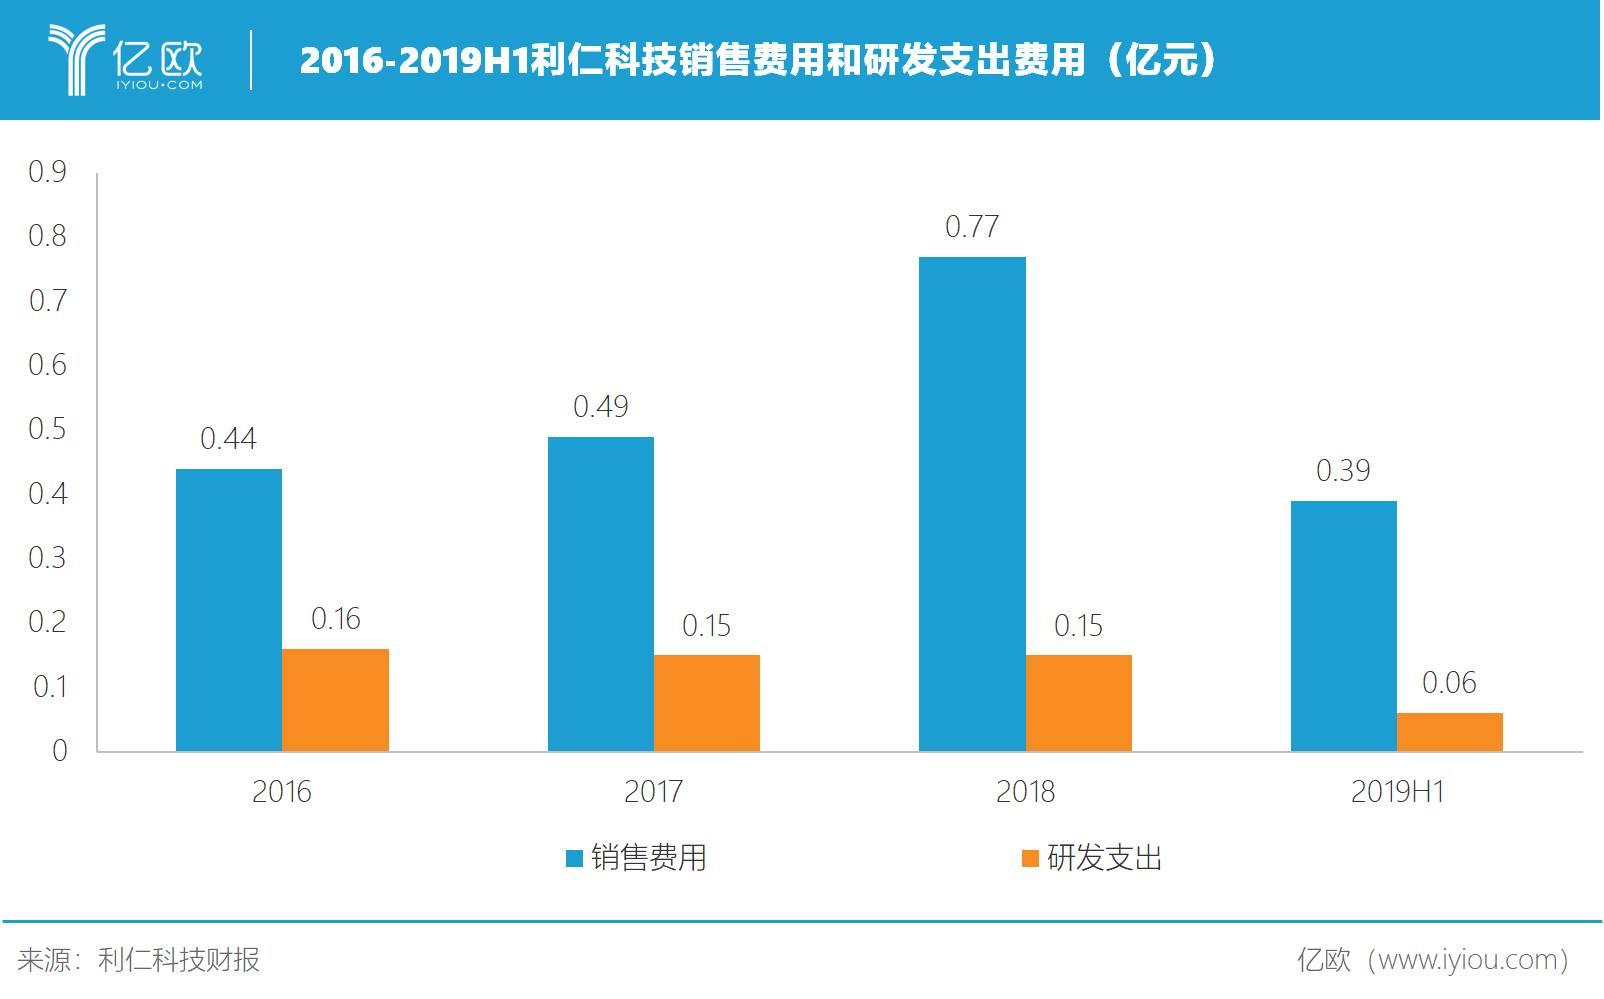 2016-2019H1利仁科技销售费用和研发支出费用(亿元)